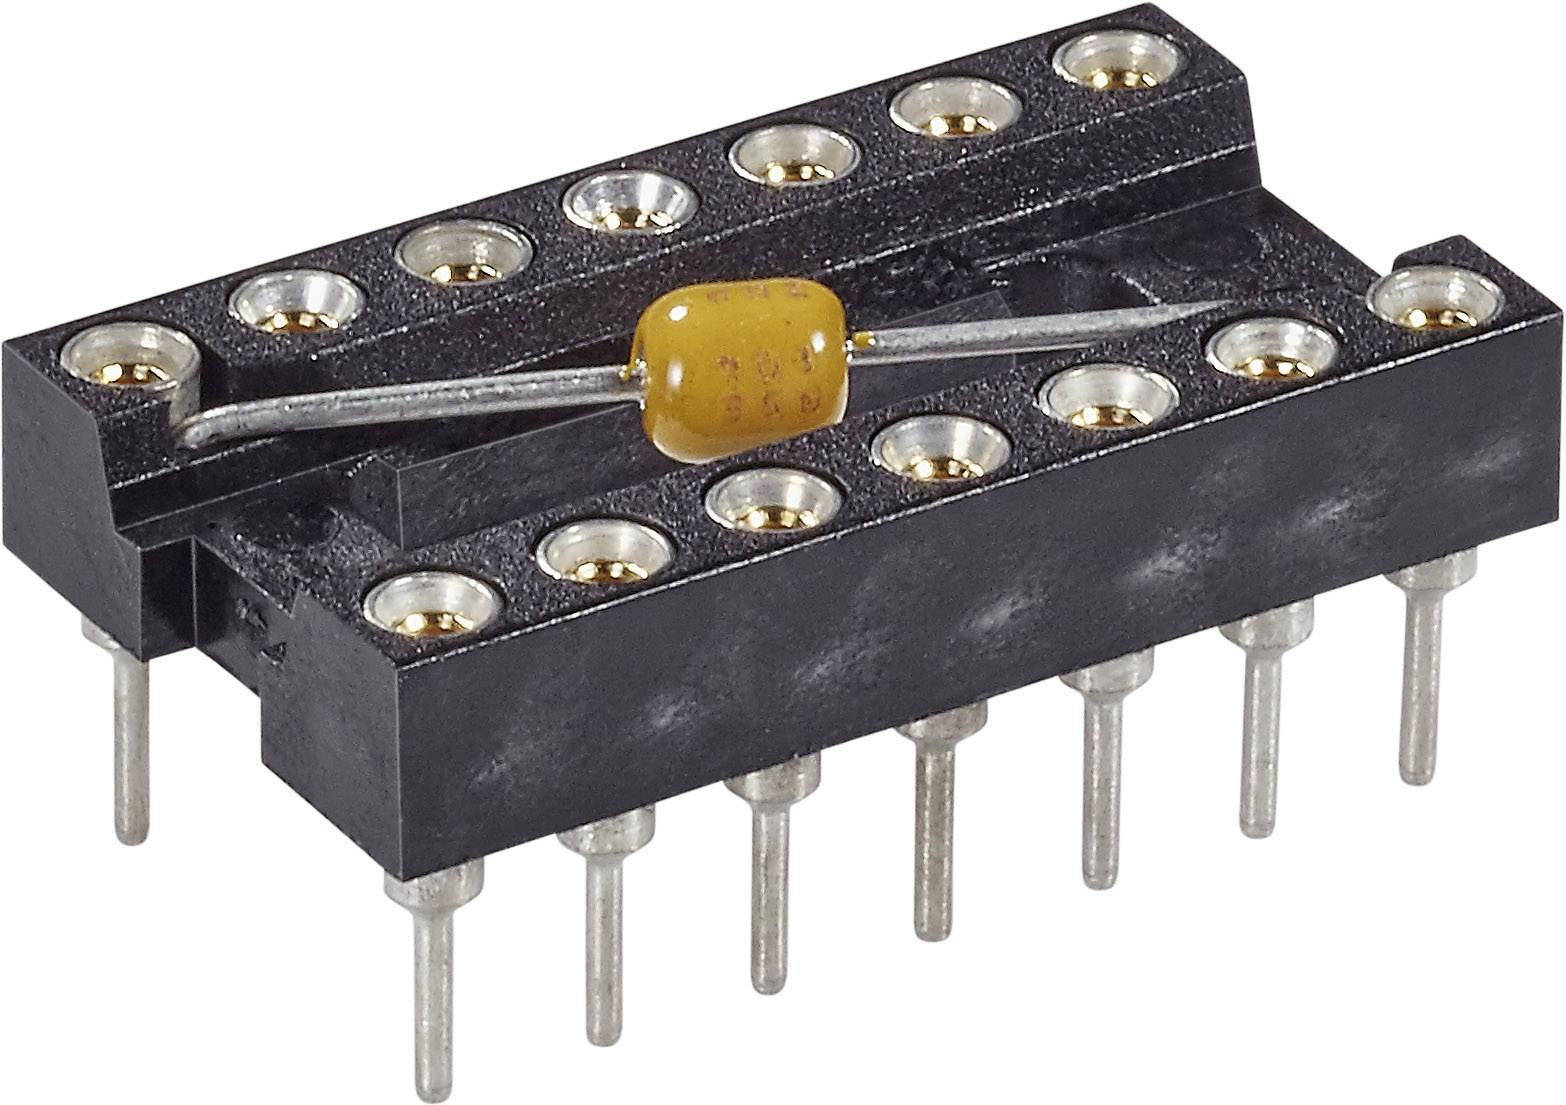 IC pätica MPE Garry 001-3-008-3-B1STF-XT0 presné kontakty, s kondenzátorom, rozteč 7.62 mm, pólů 8, 1 ks